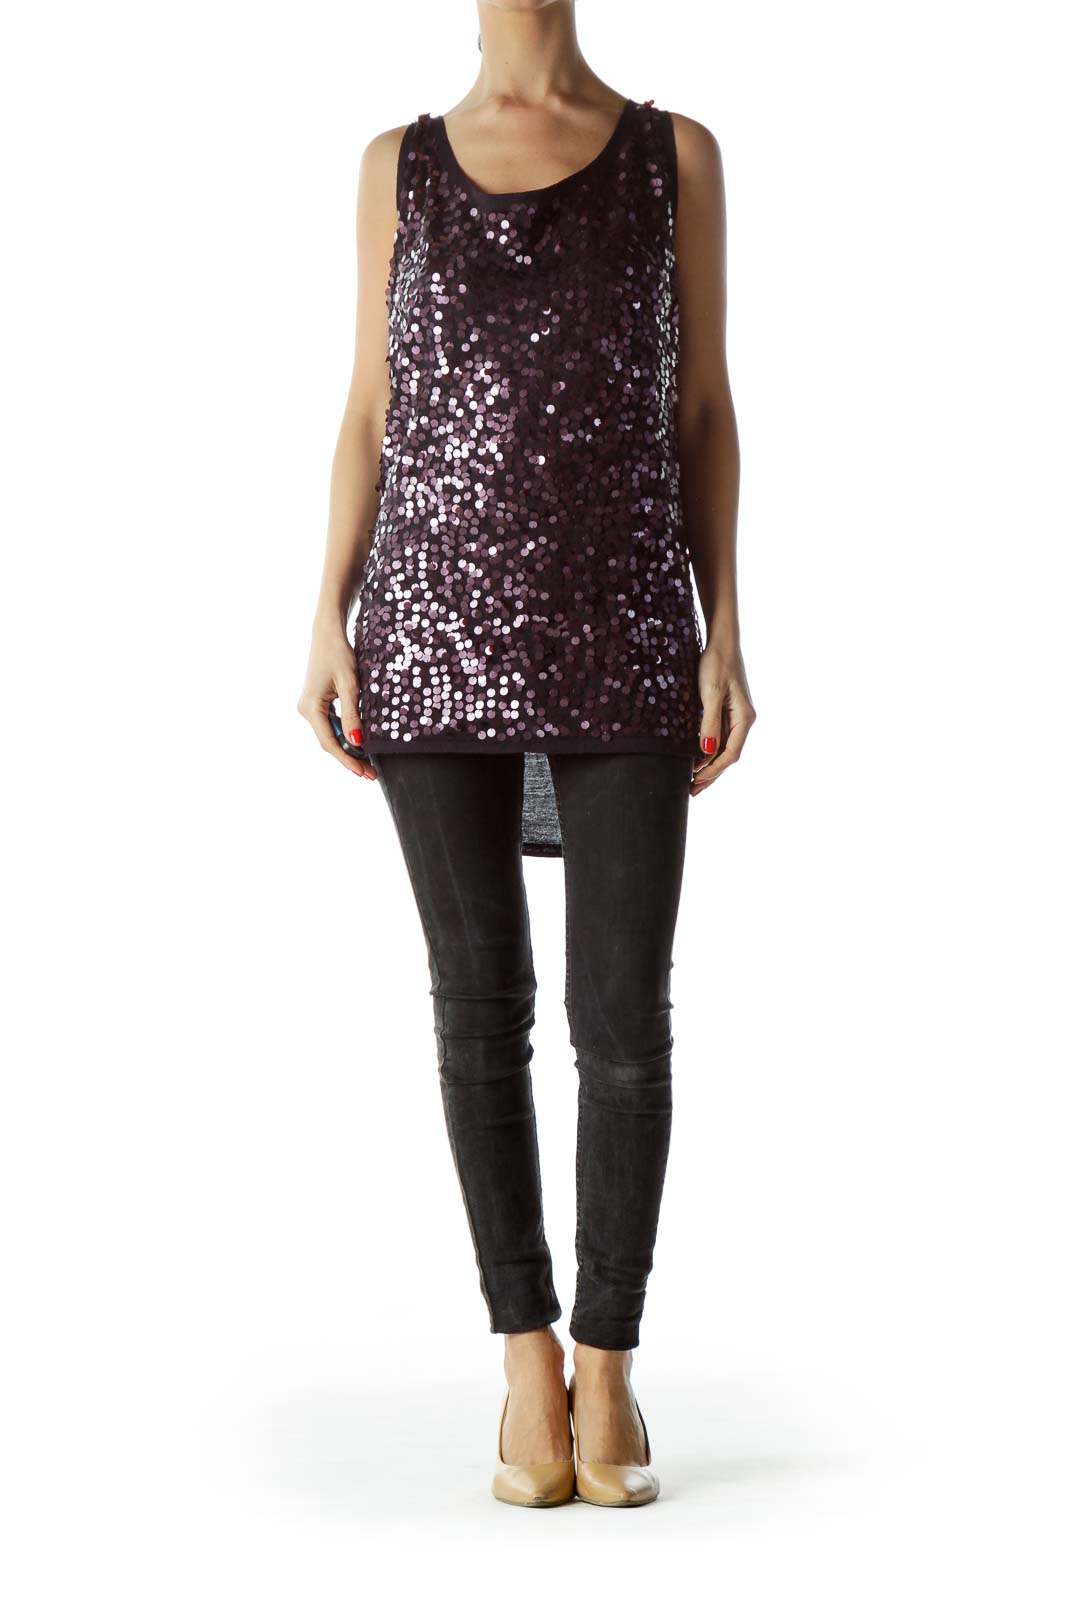 Black Purple Sequins Sleeveless Knit Top